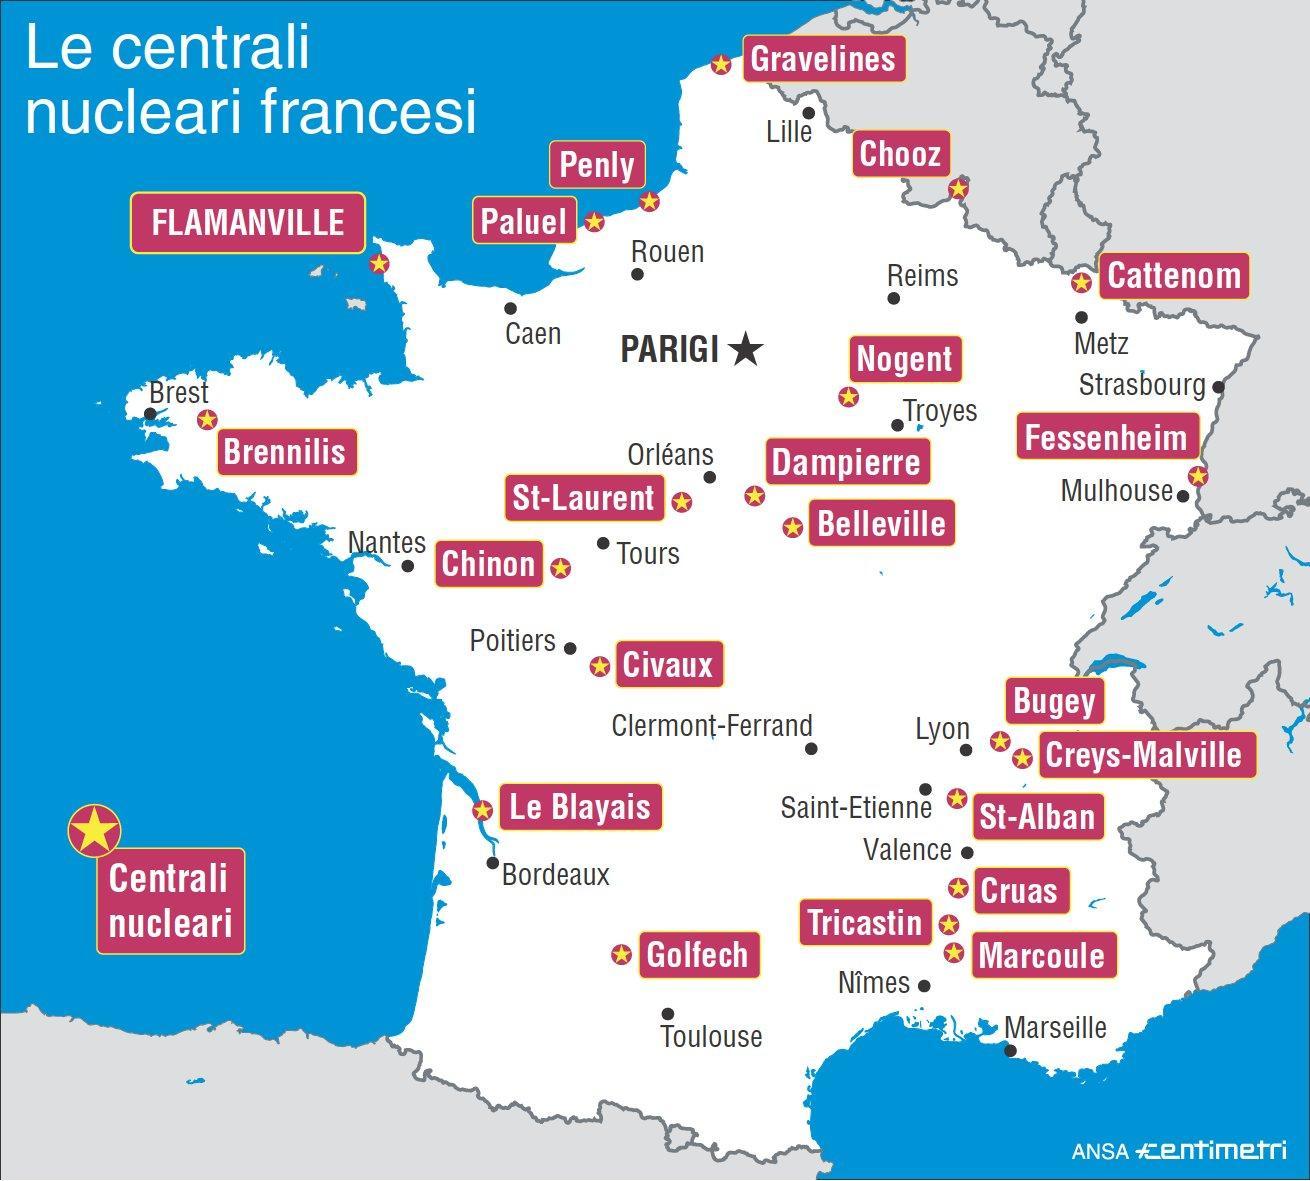 Francia Tutte Le Centrali Nucleari Nel Paese